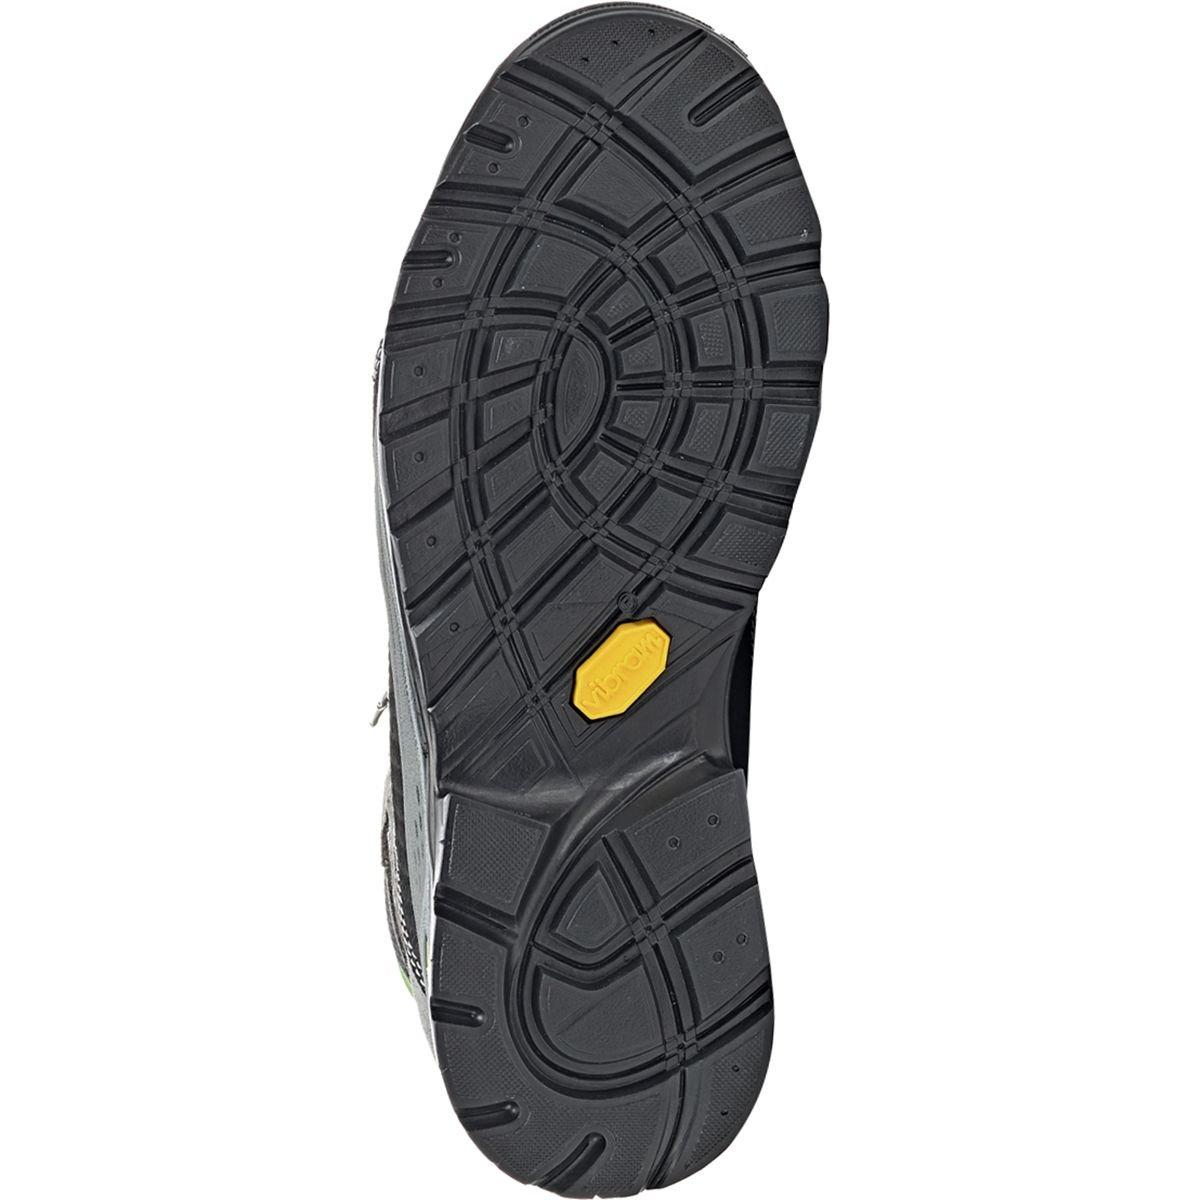 Asolo Drifter GV Evo Boot - Women's B07DCCBK5F 9.5 B(M) US|Donkey/English Ivy